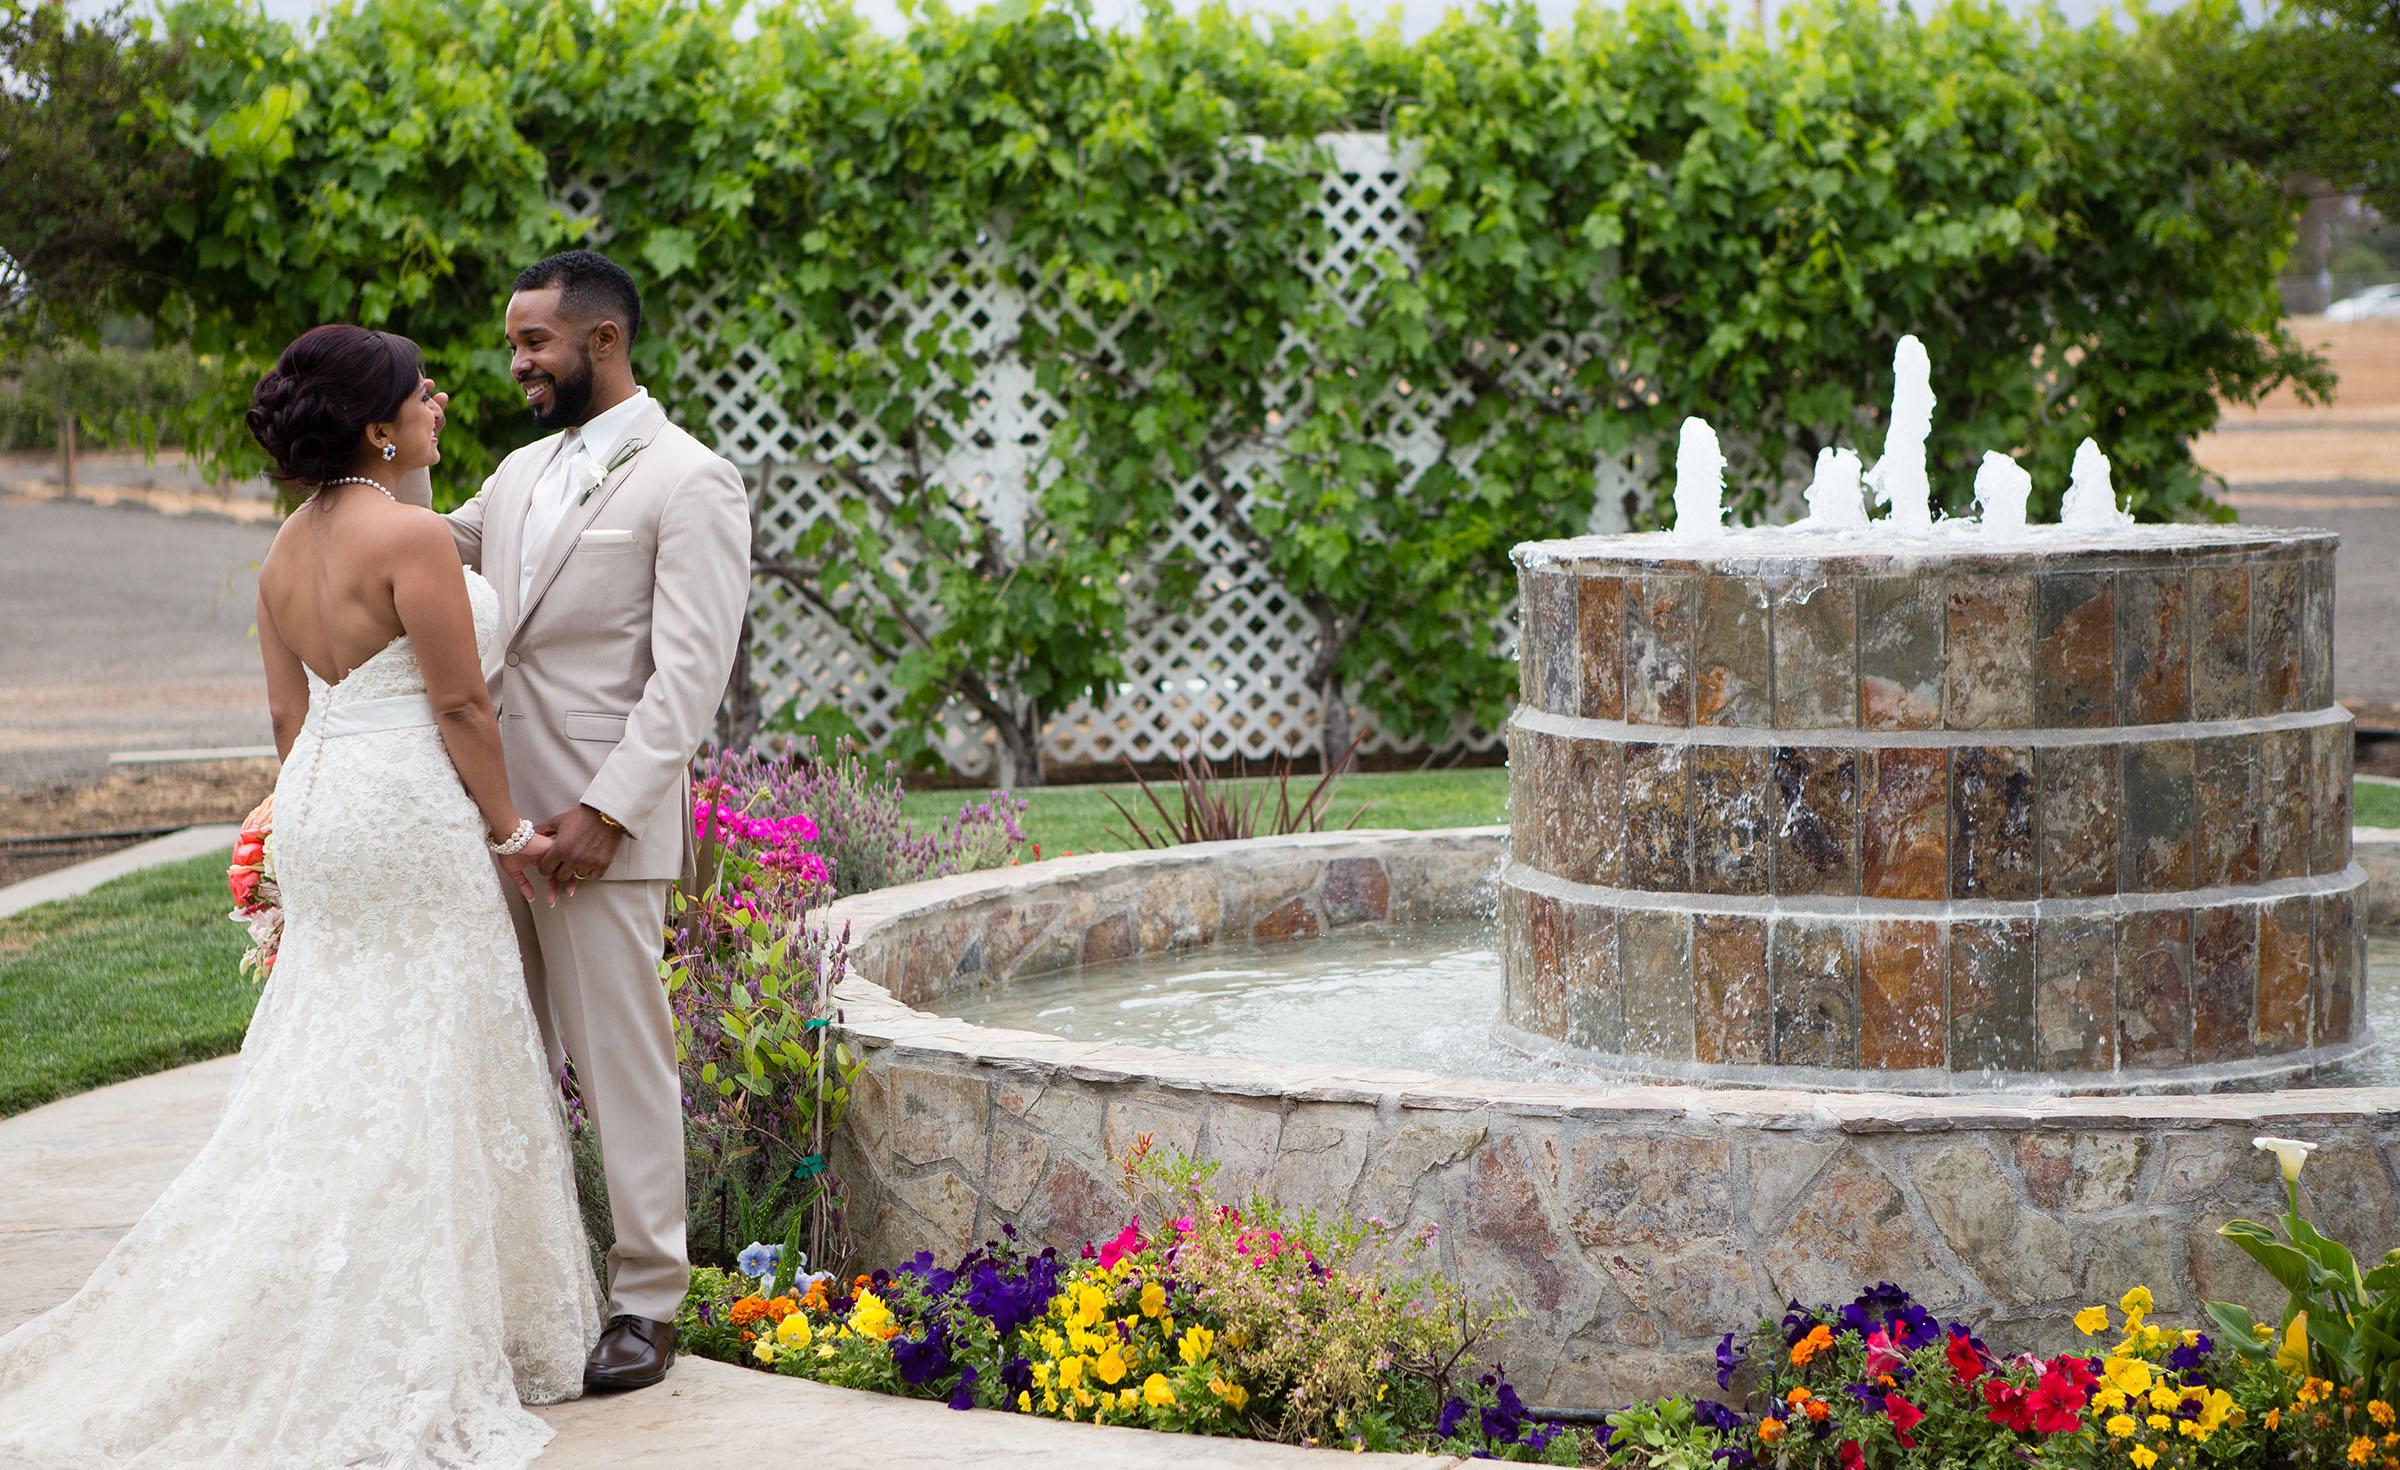 Newlyweds by fountain